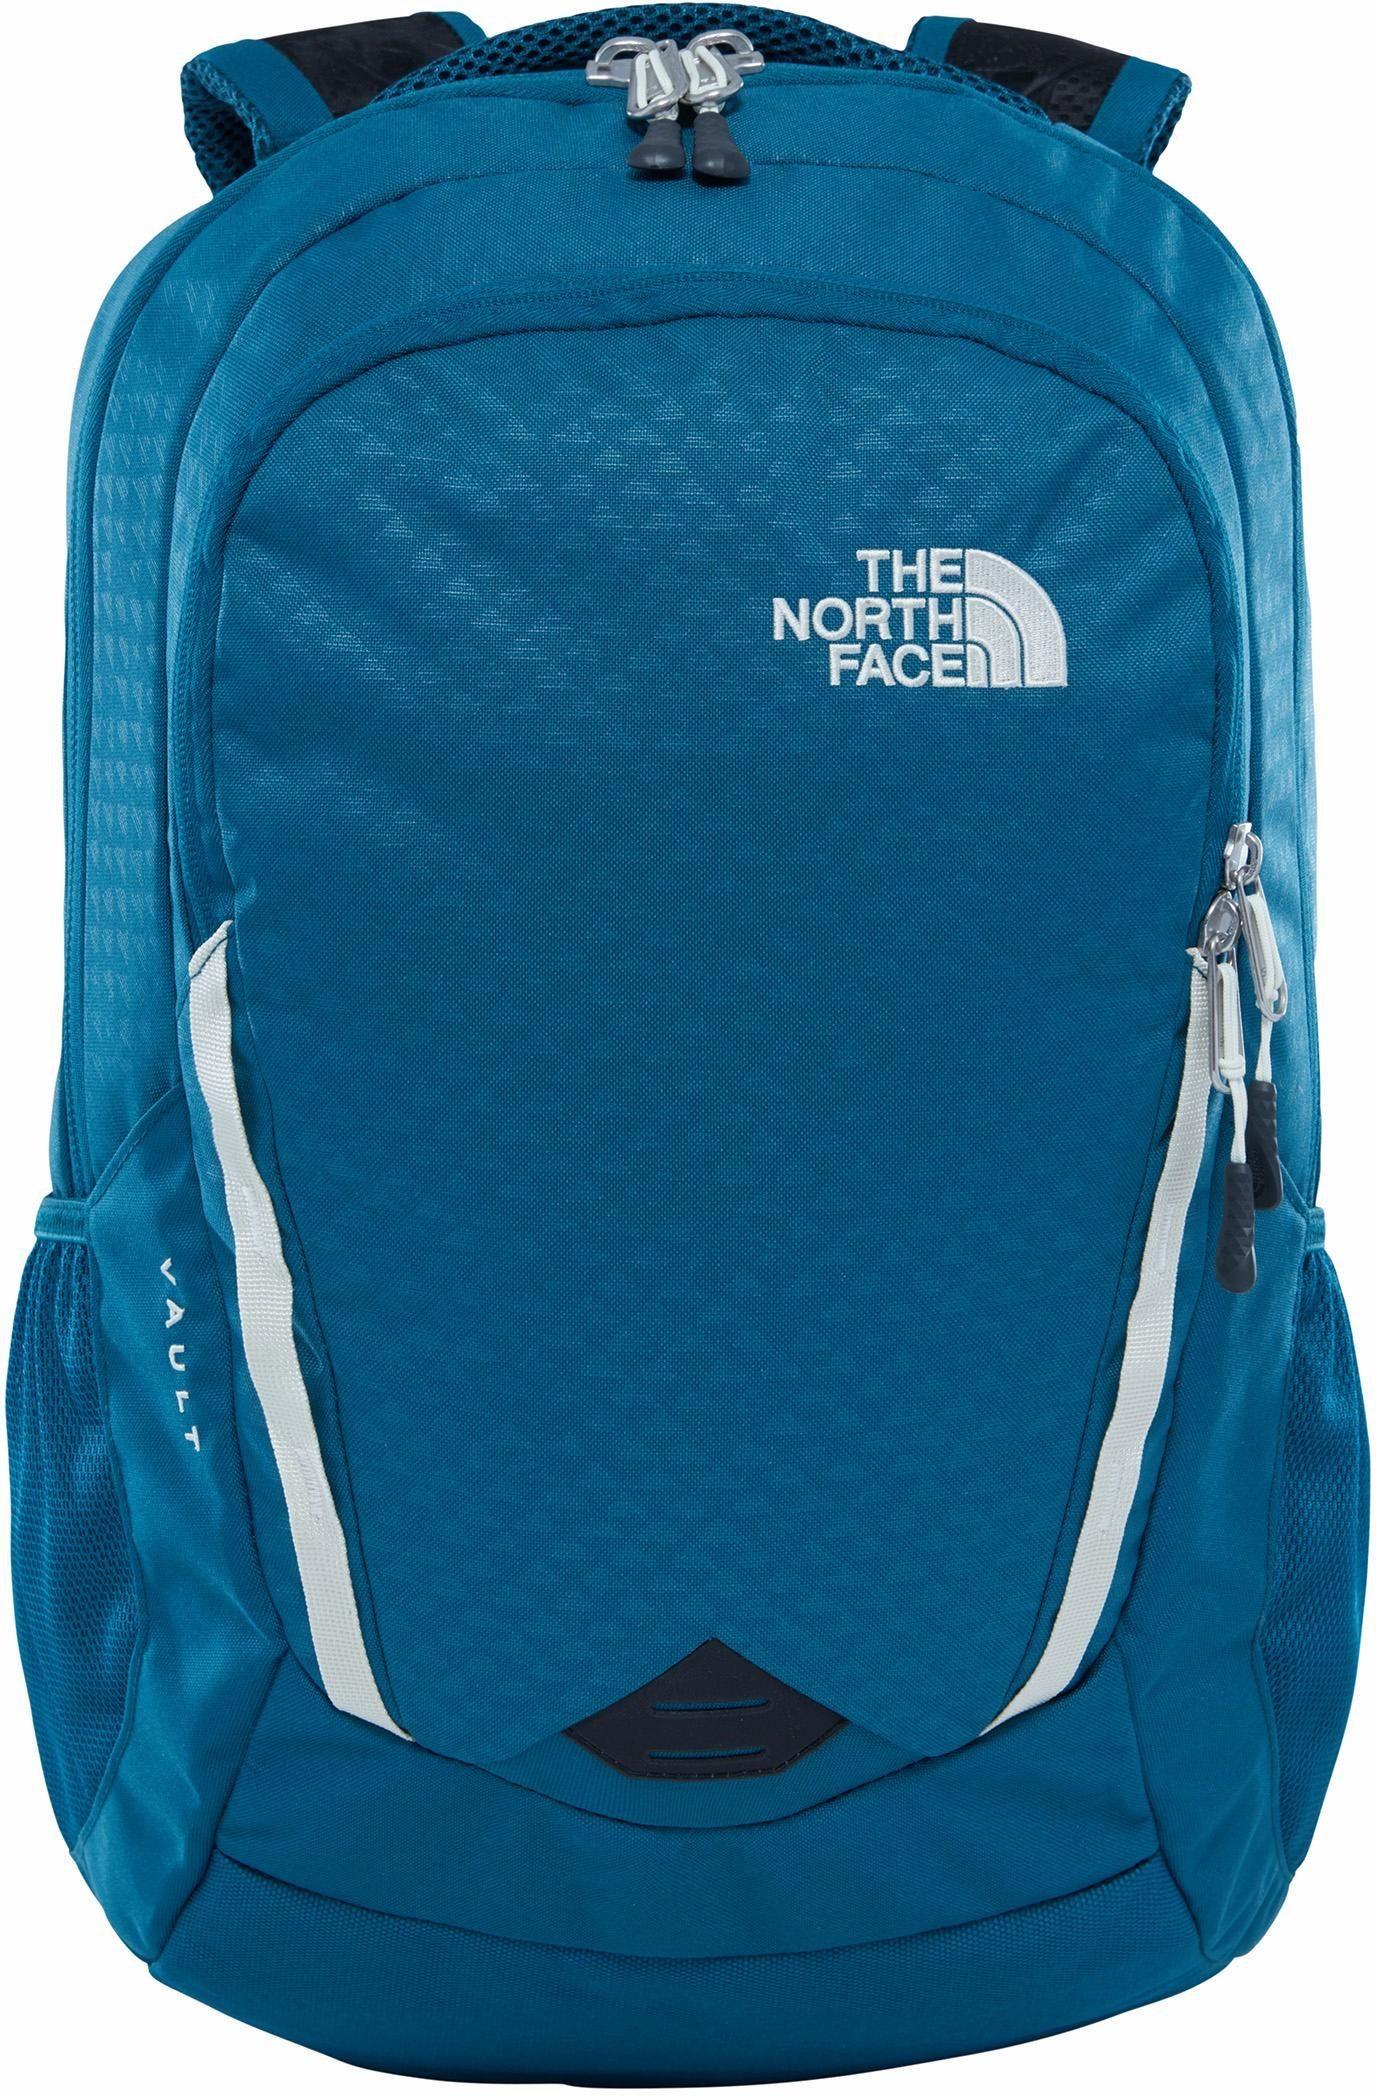 The North Face Rucksack mit 15-Zoll Laptopfach, »W Vault, Blue/White«